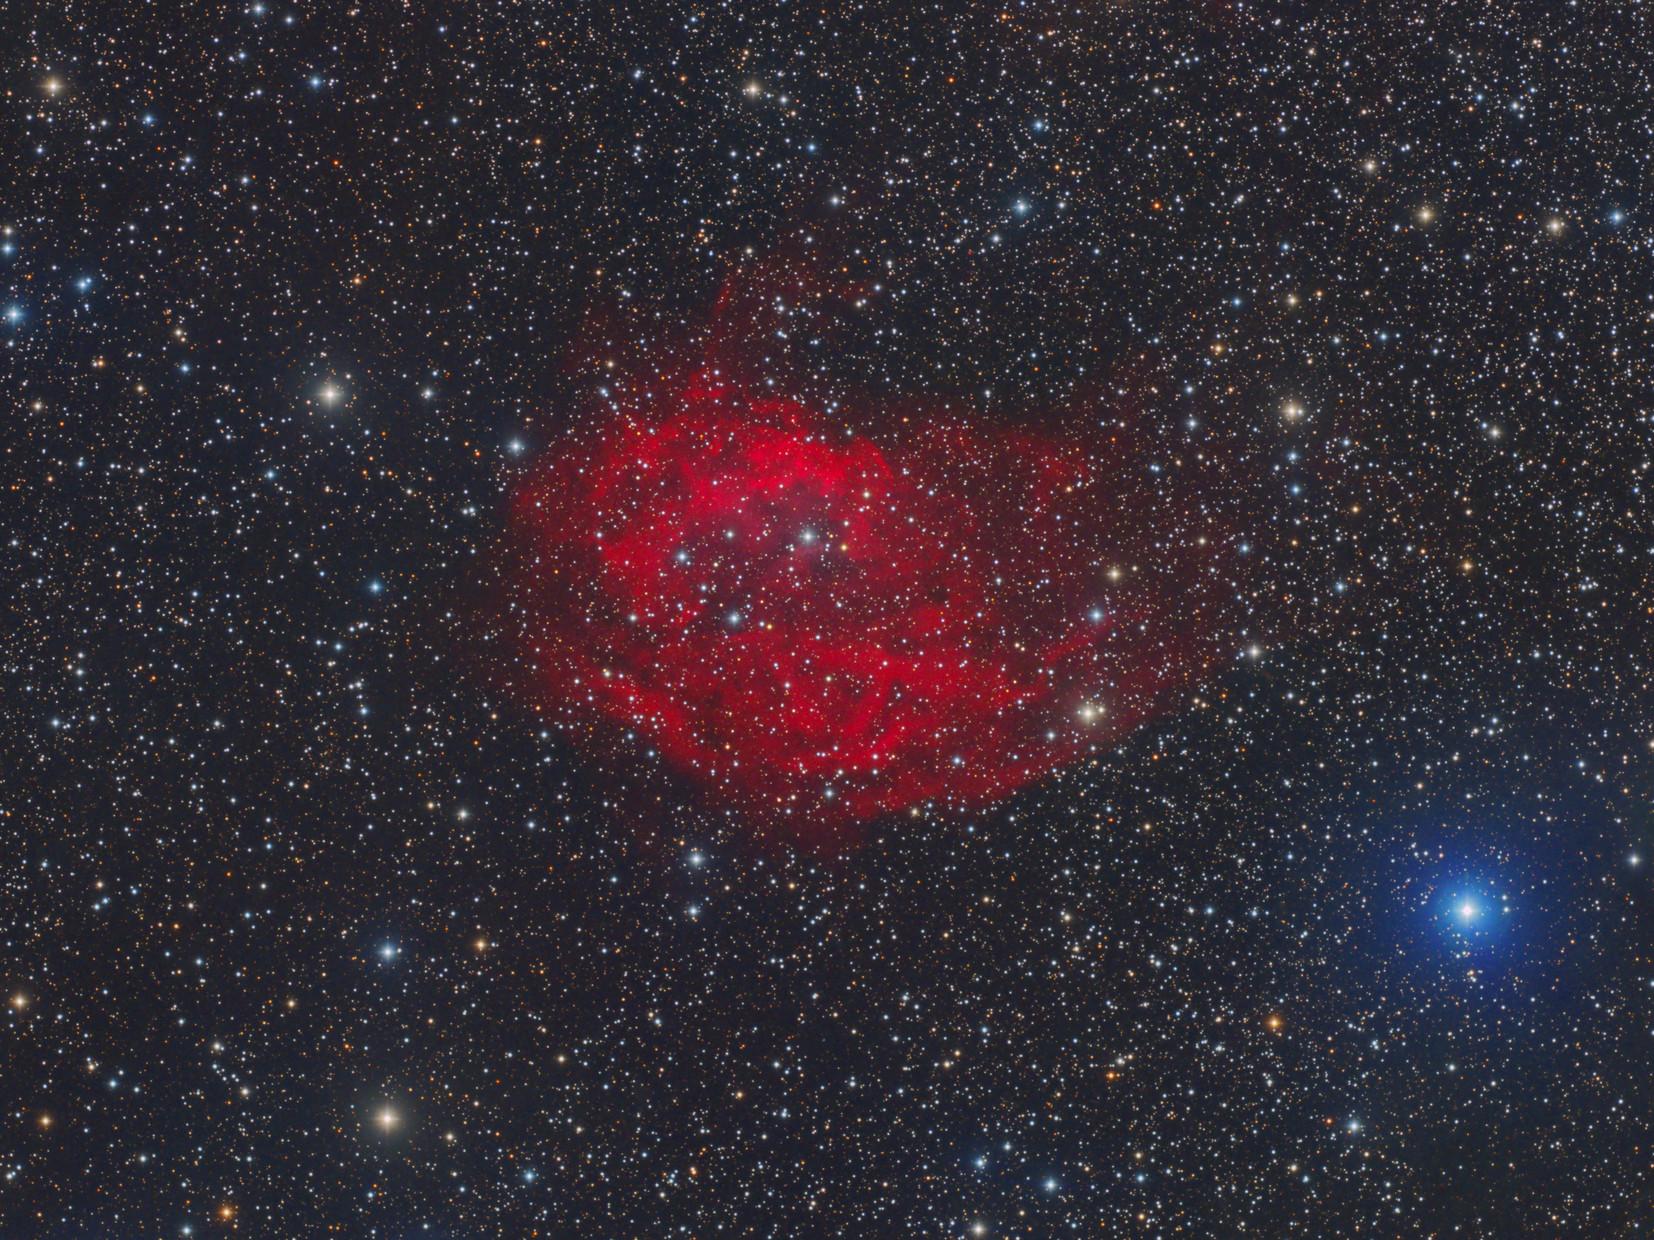 Sh2-261 La nebulosa de Lower